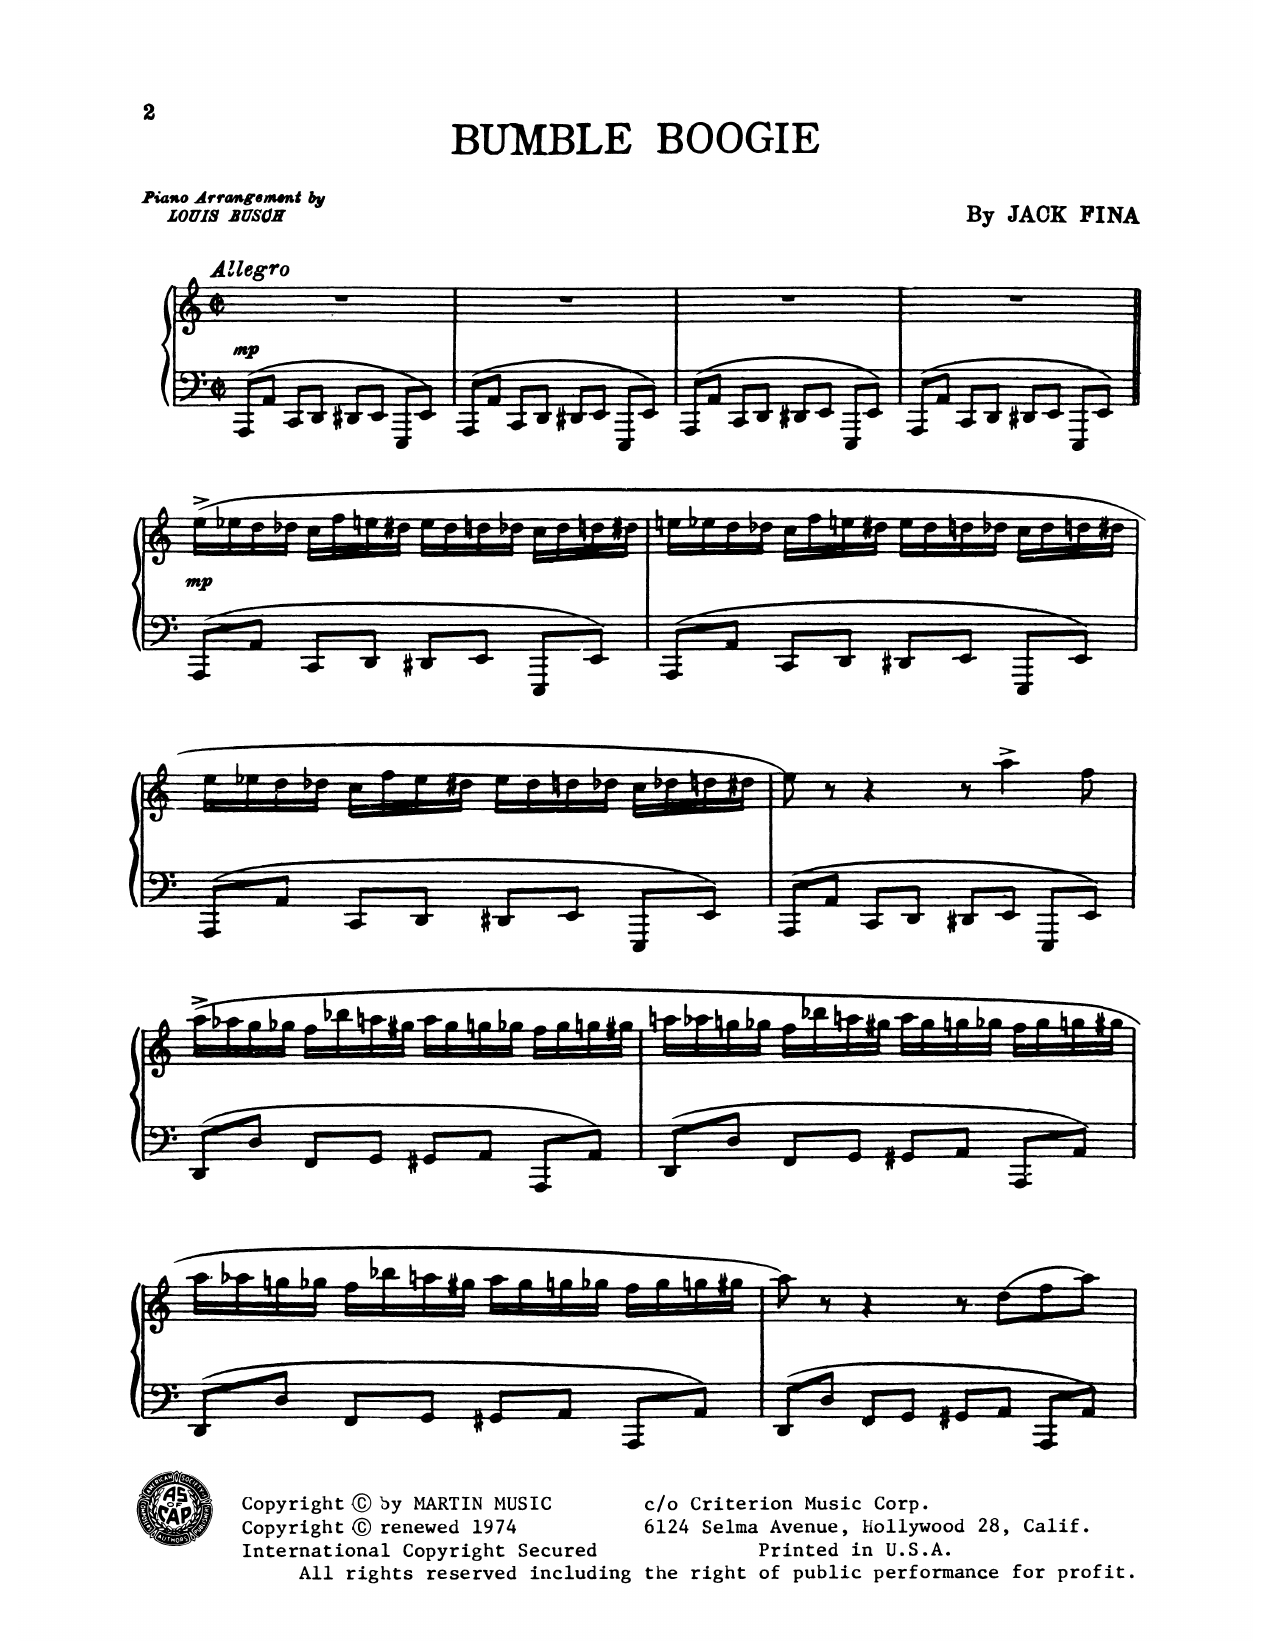 Bumble Boogie - SHEET MUSIC - Jack Fina's famous boogie ...